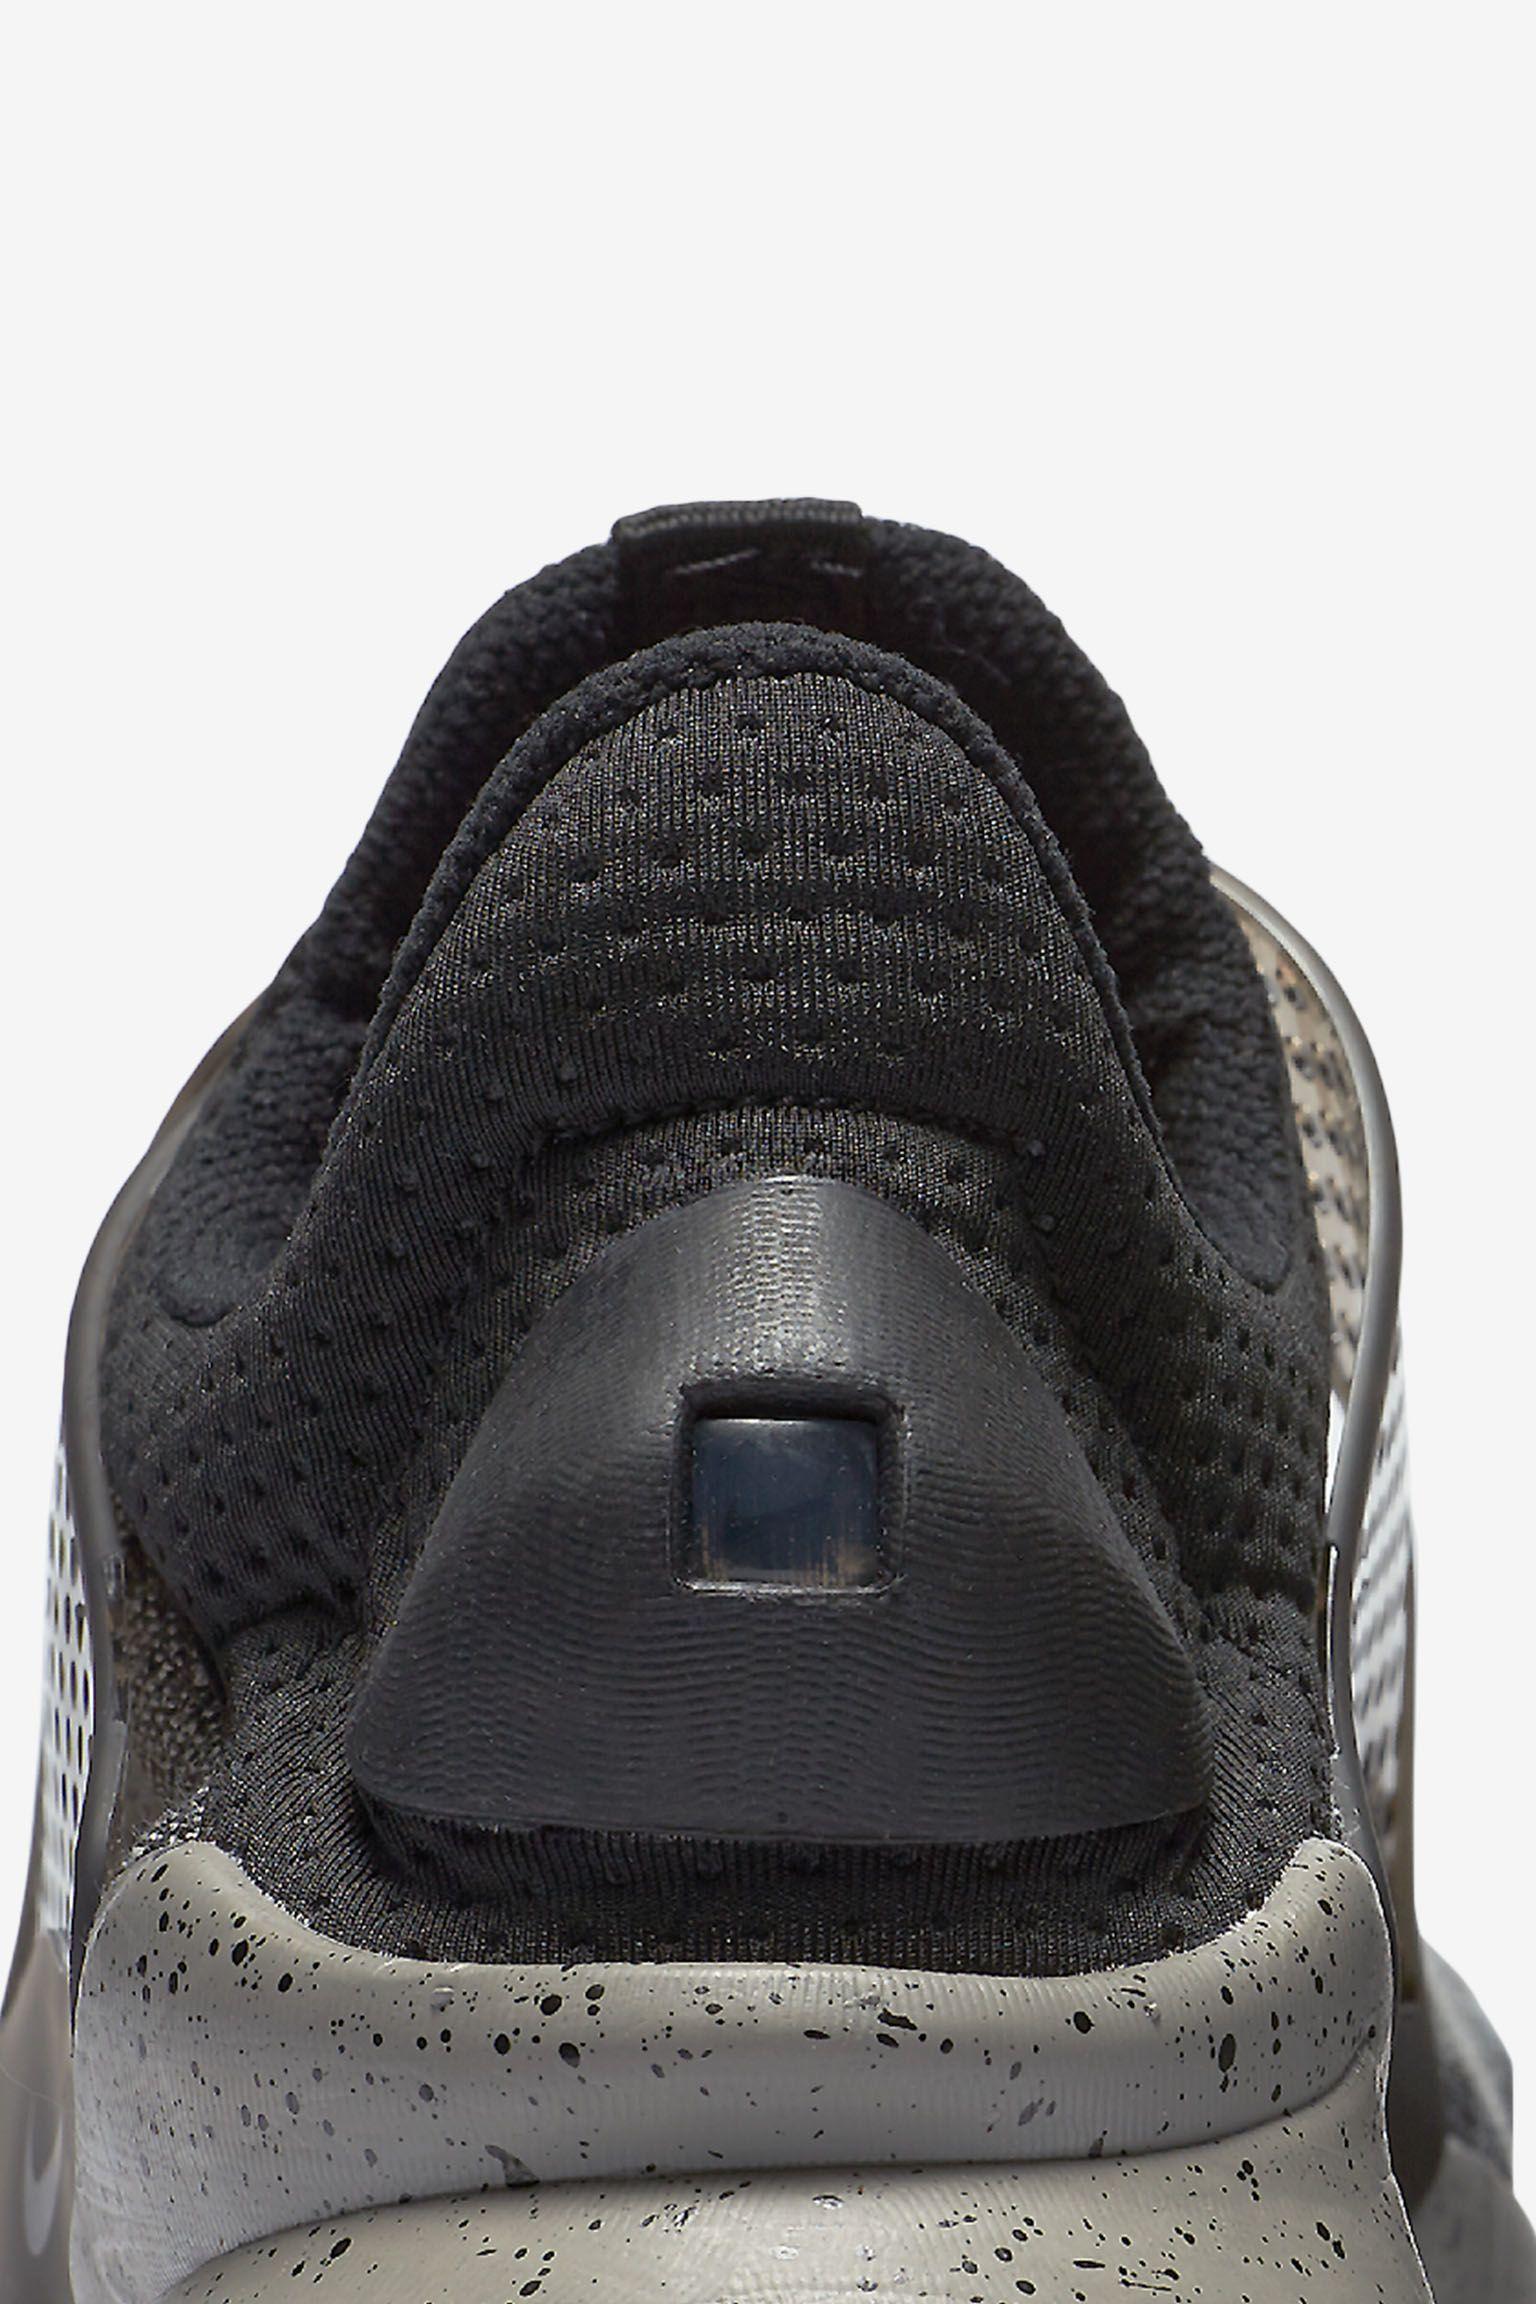 Nike Sock Dart SE Premium 'Dust Grey'